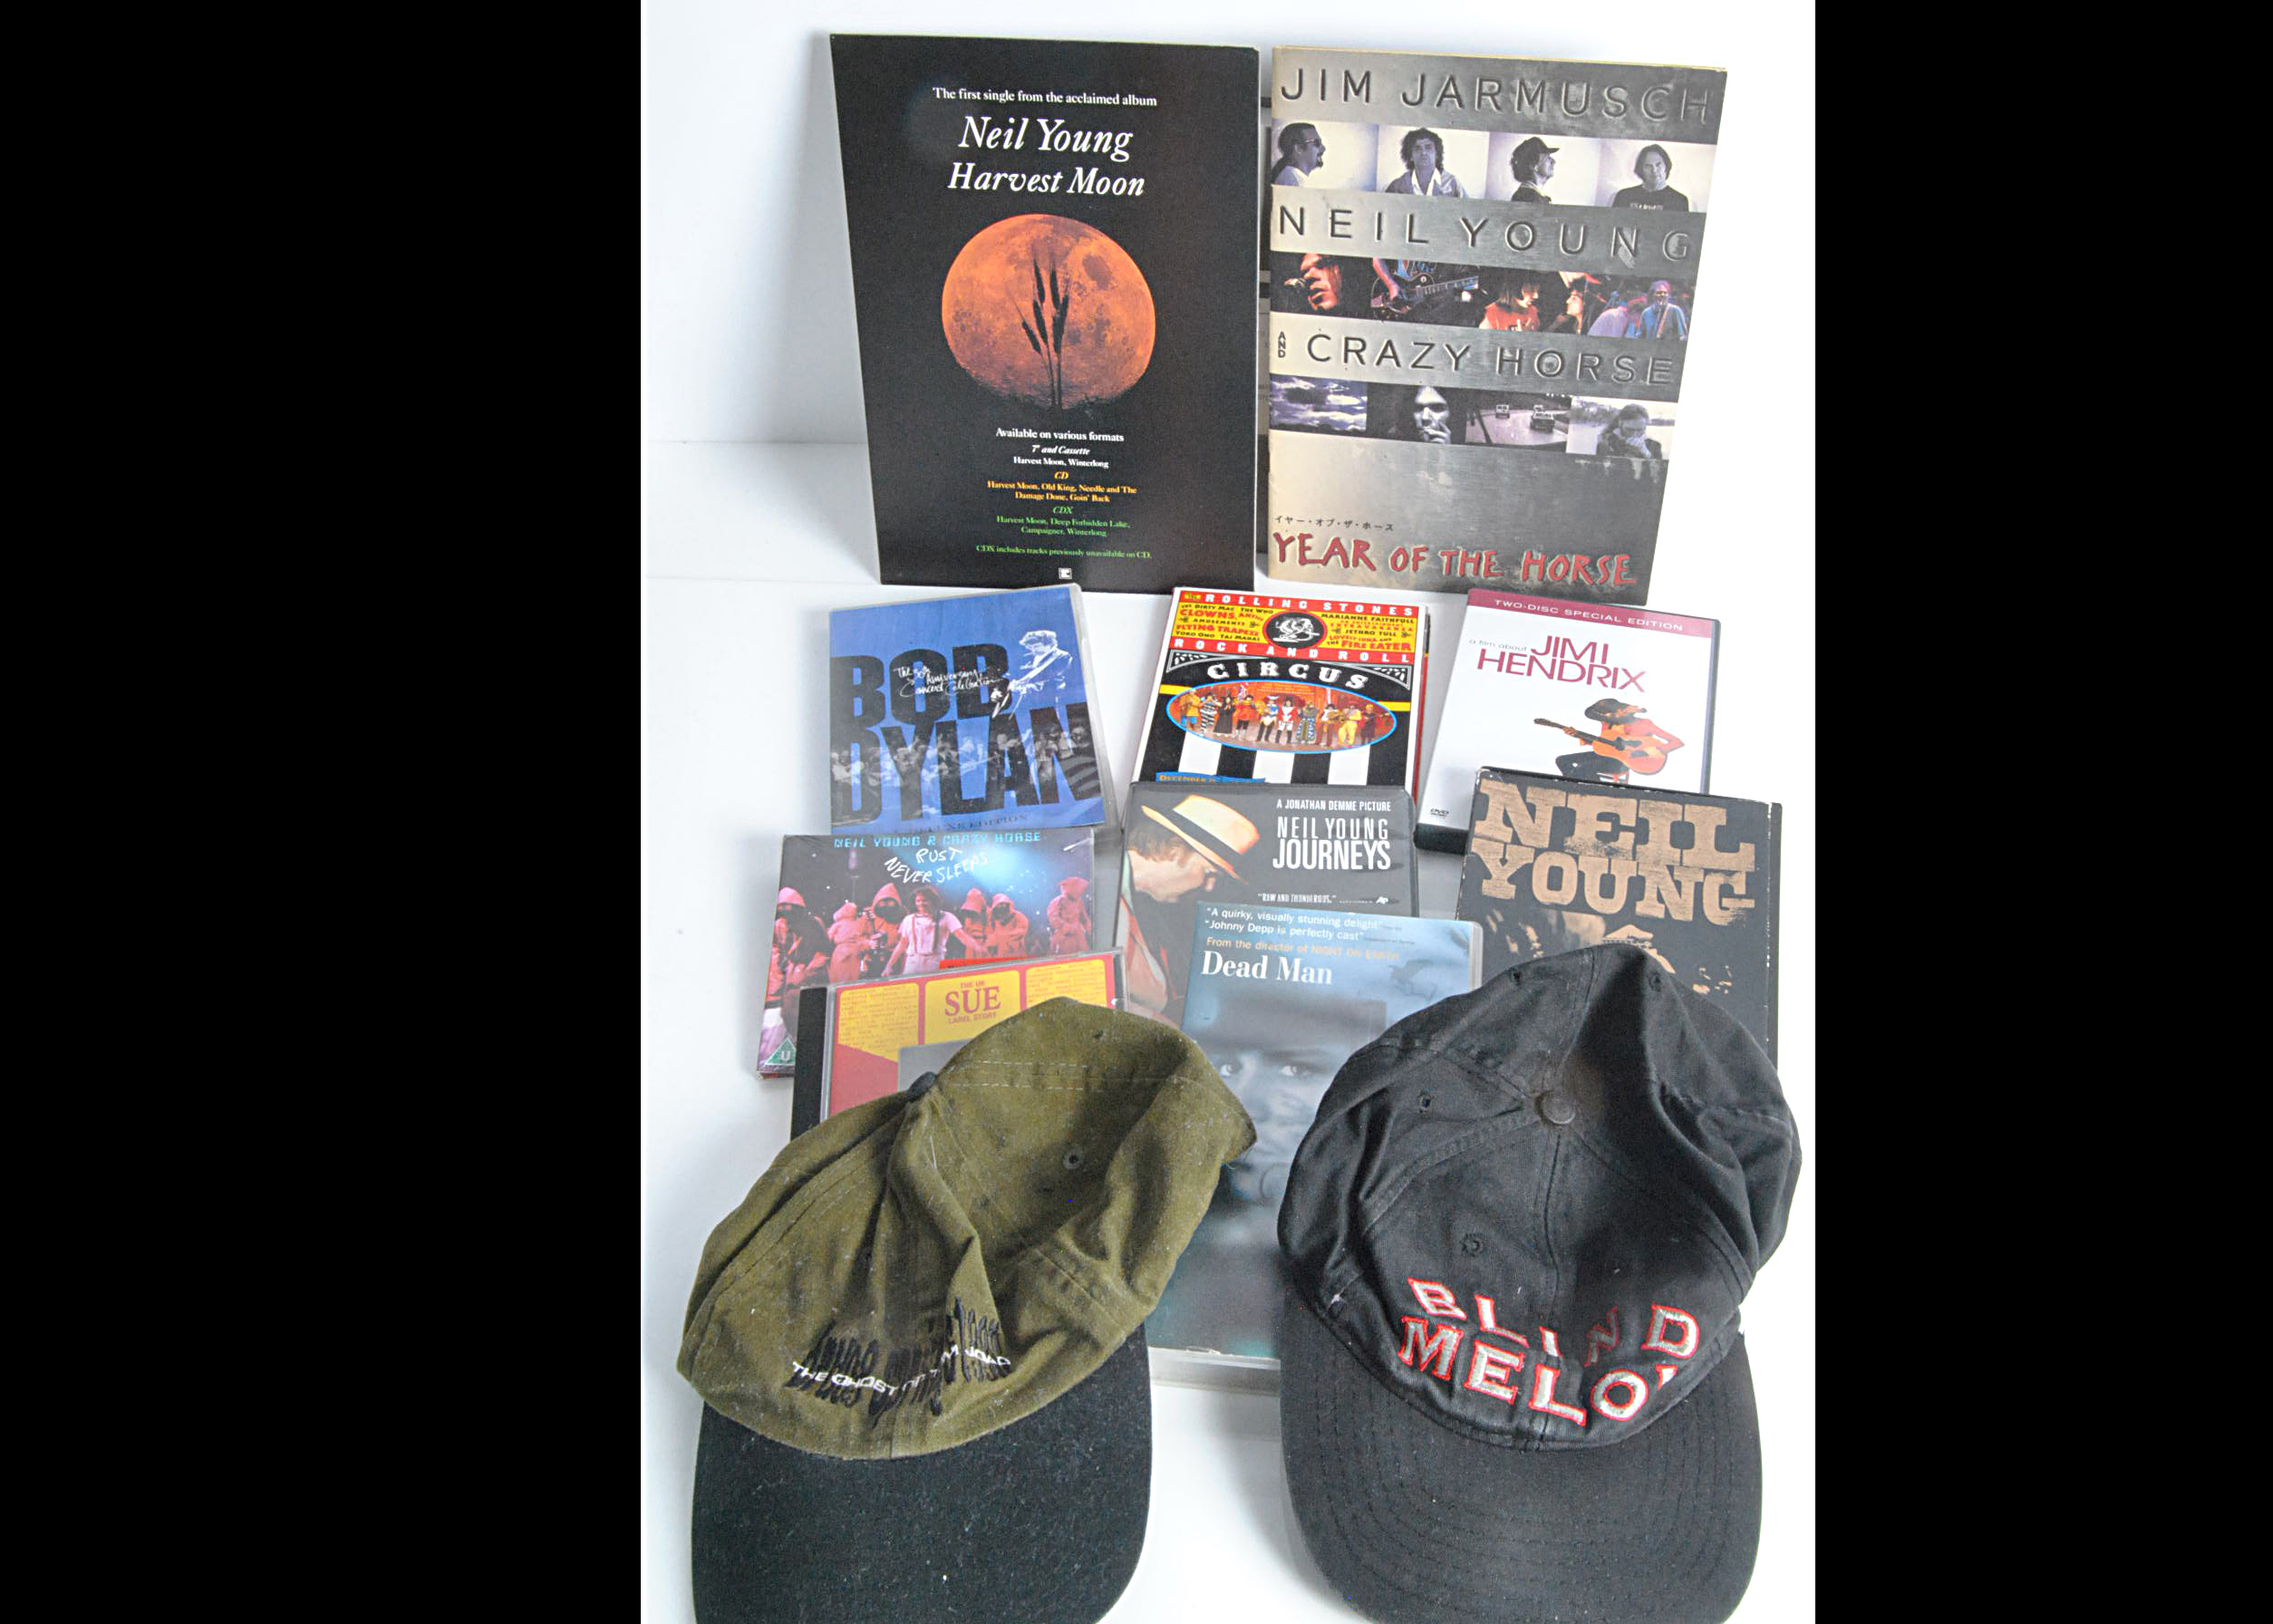 Neil Young Memorabilia plus, large collection of Neil Young memorabilia including Tim Pope and WEA